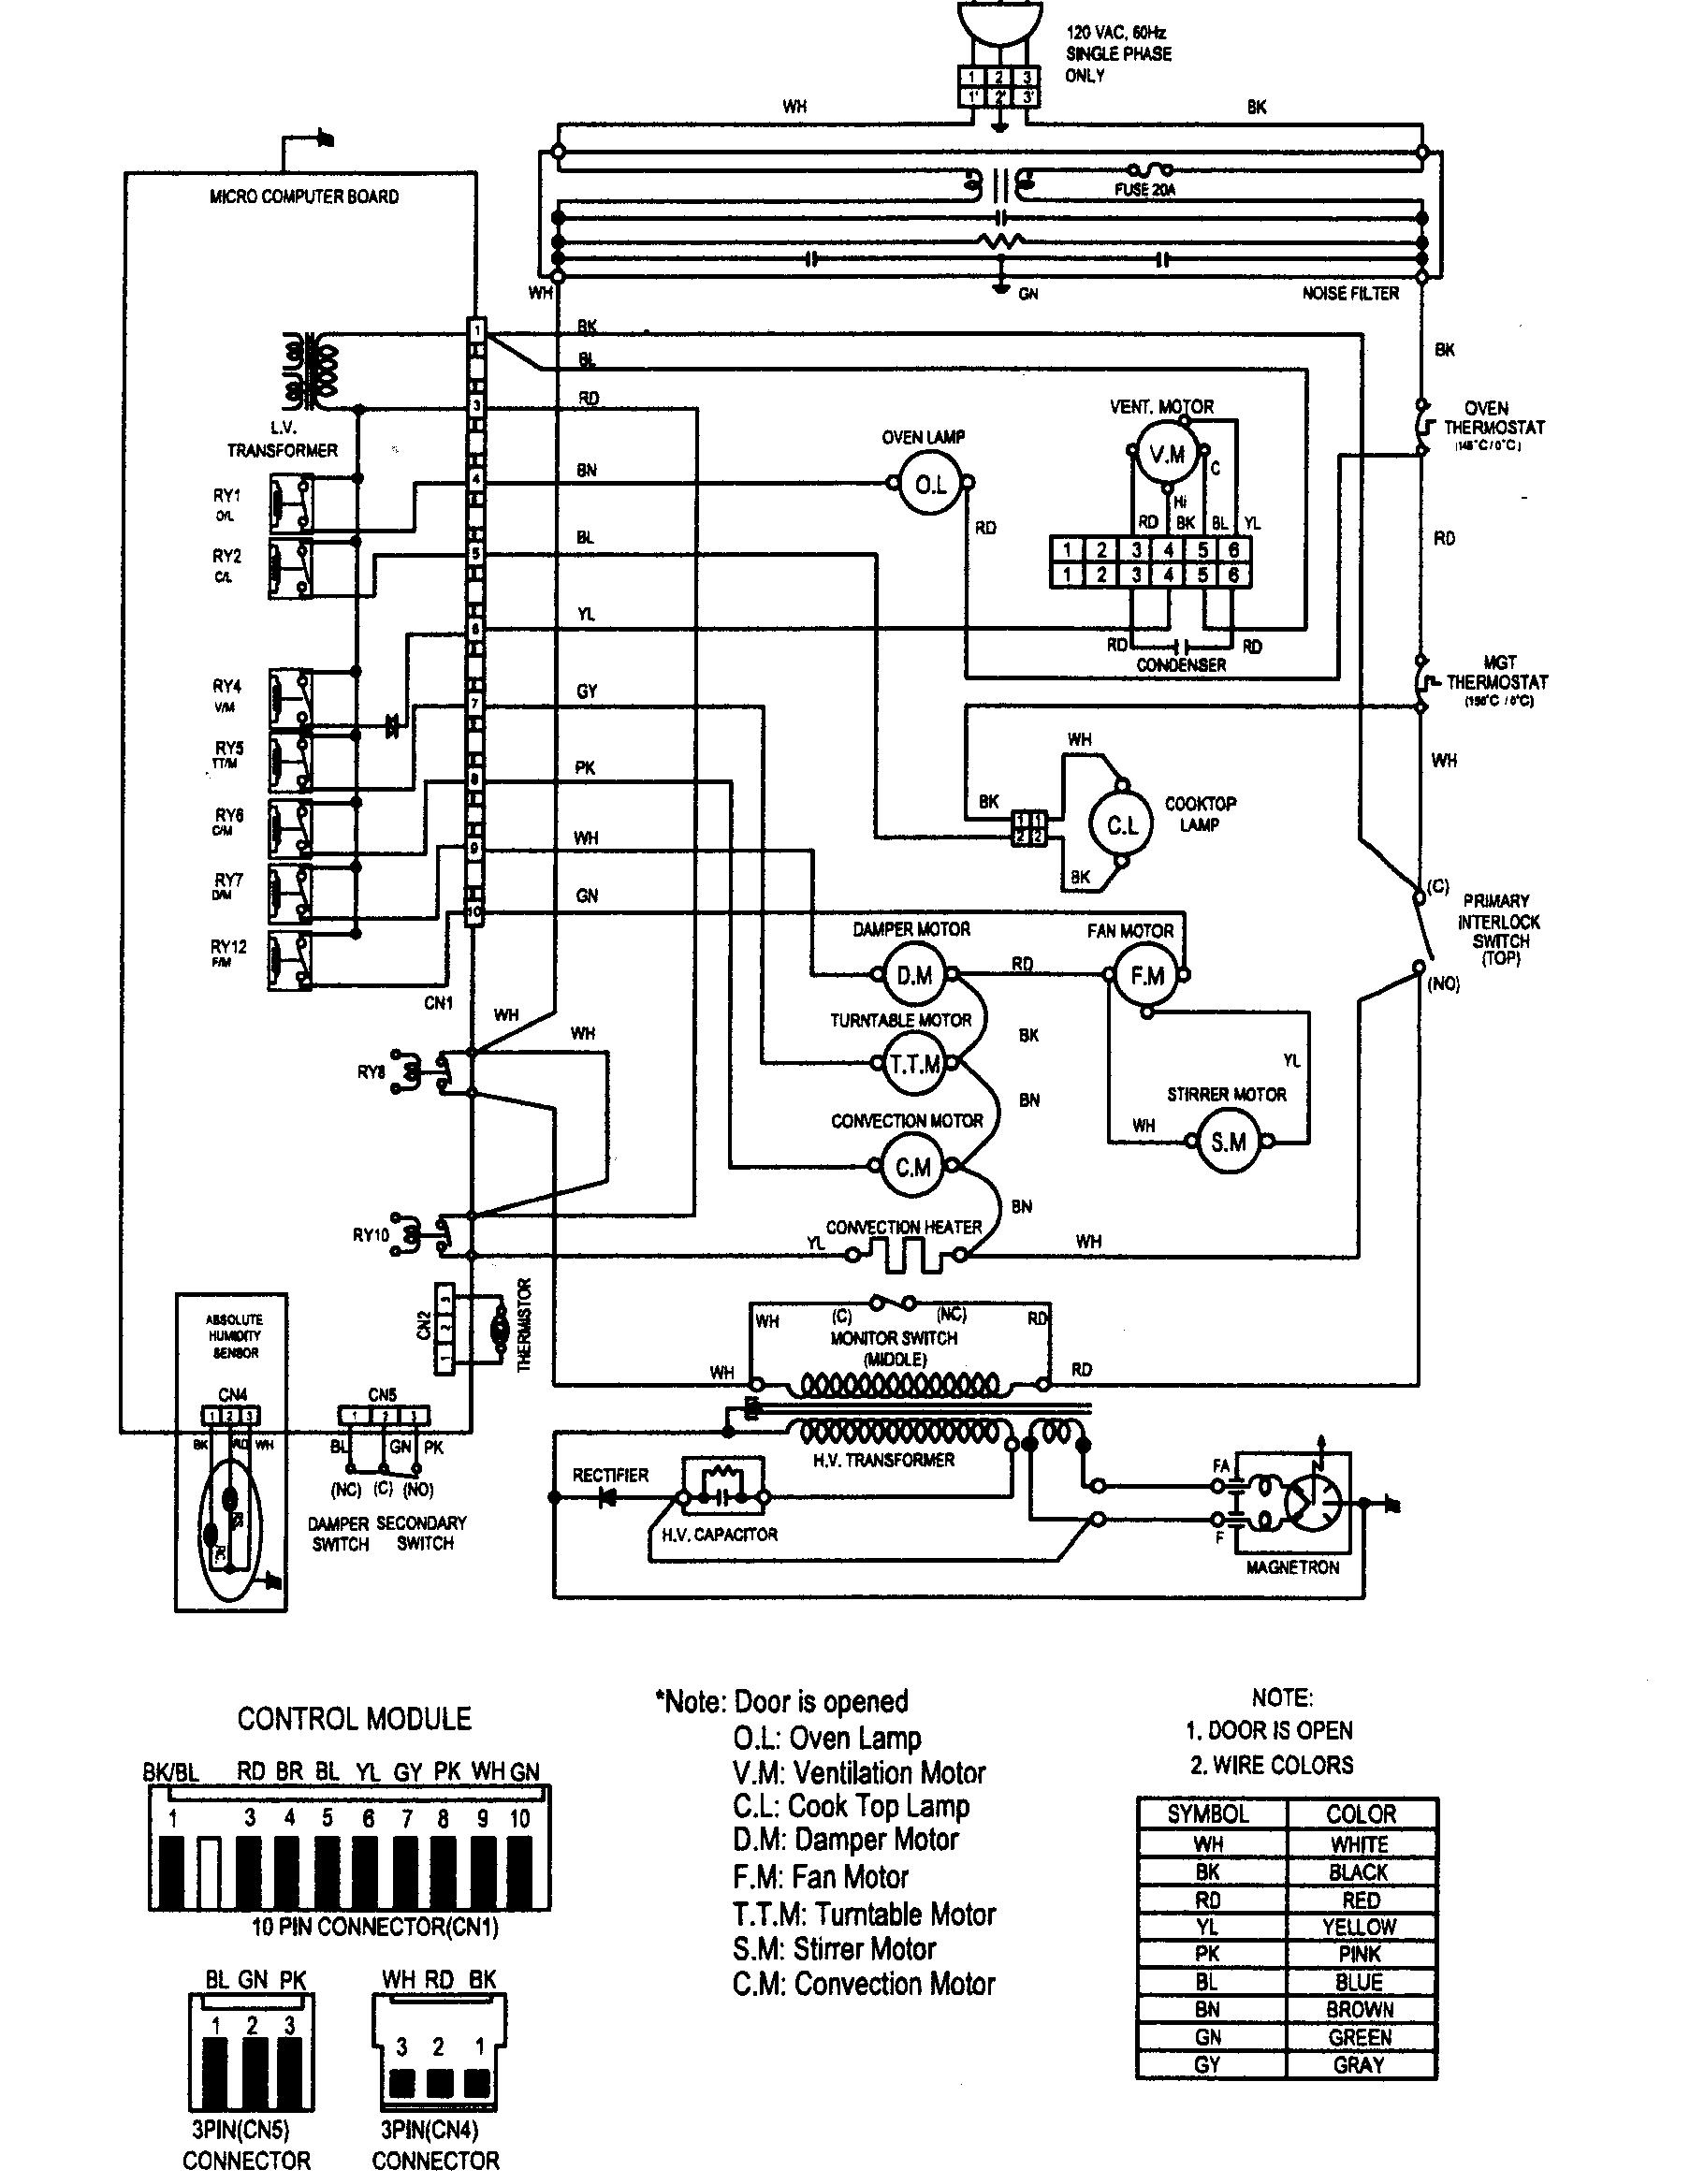 Kenmore Dryer Wiring Diagram